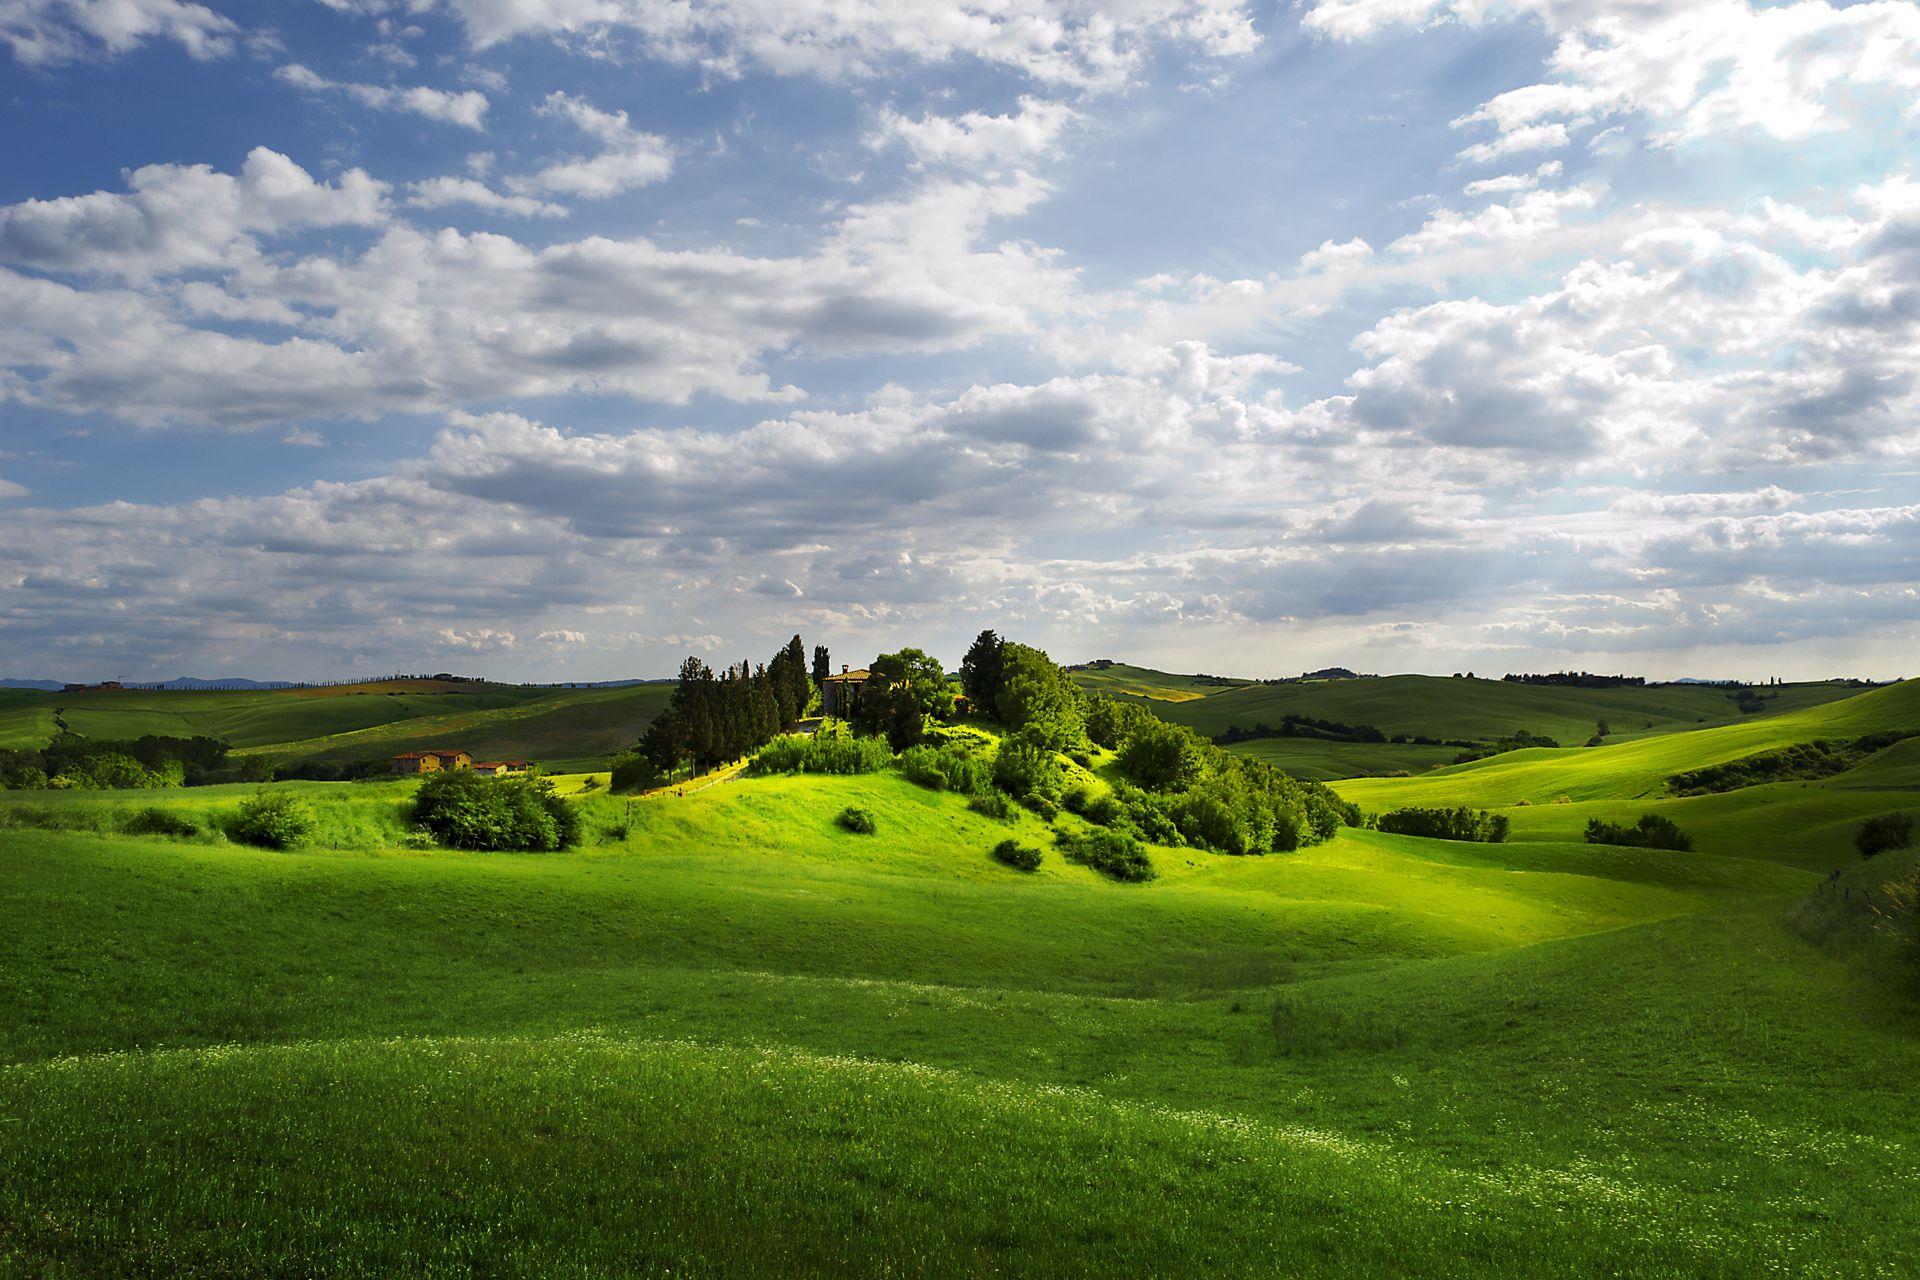 Serenity Sky Clouds Rays Light Field Hills Flat Dream Houses Wallpaper DesktopNature